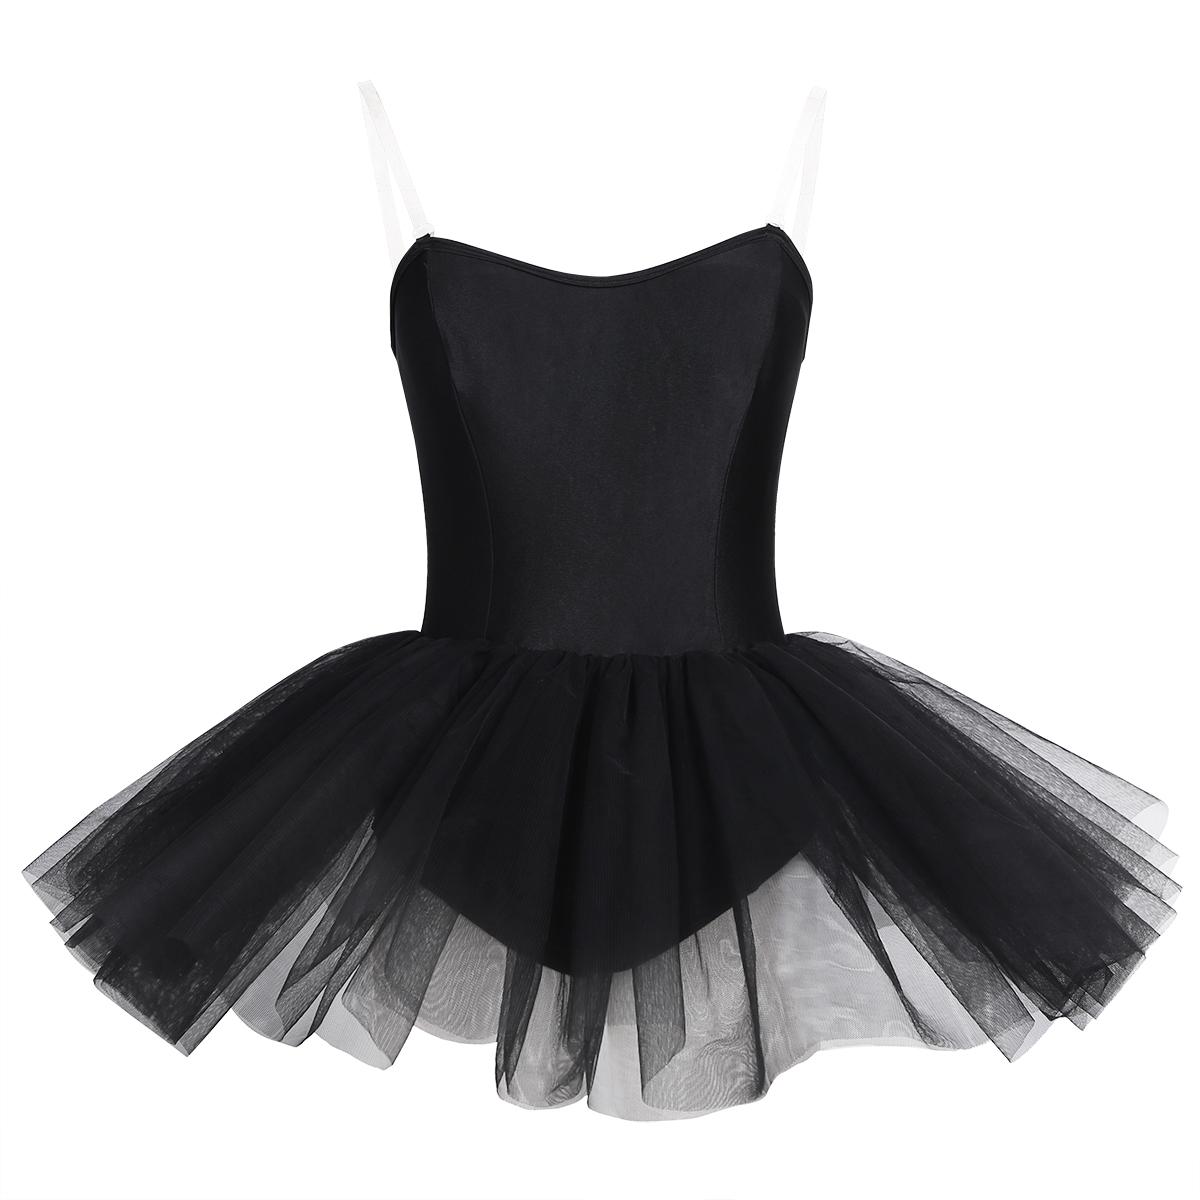 CHICTRY Kids Girls 2-Piece Flower Applique Tutu Skirt Top Set for Gymnastics Ballet Dancing or Swimming